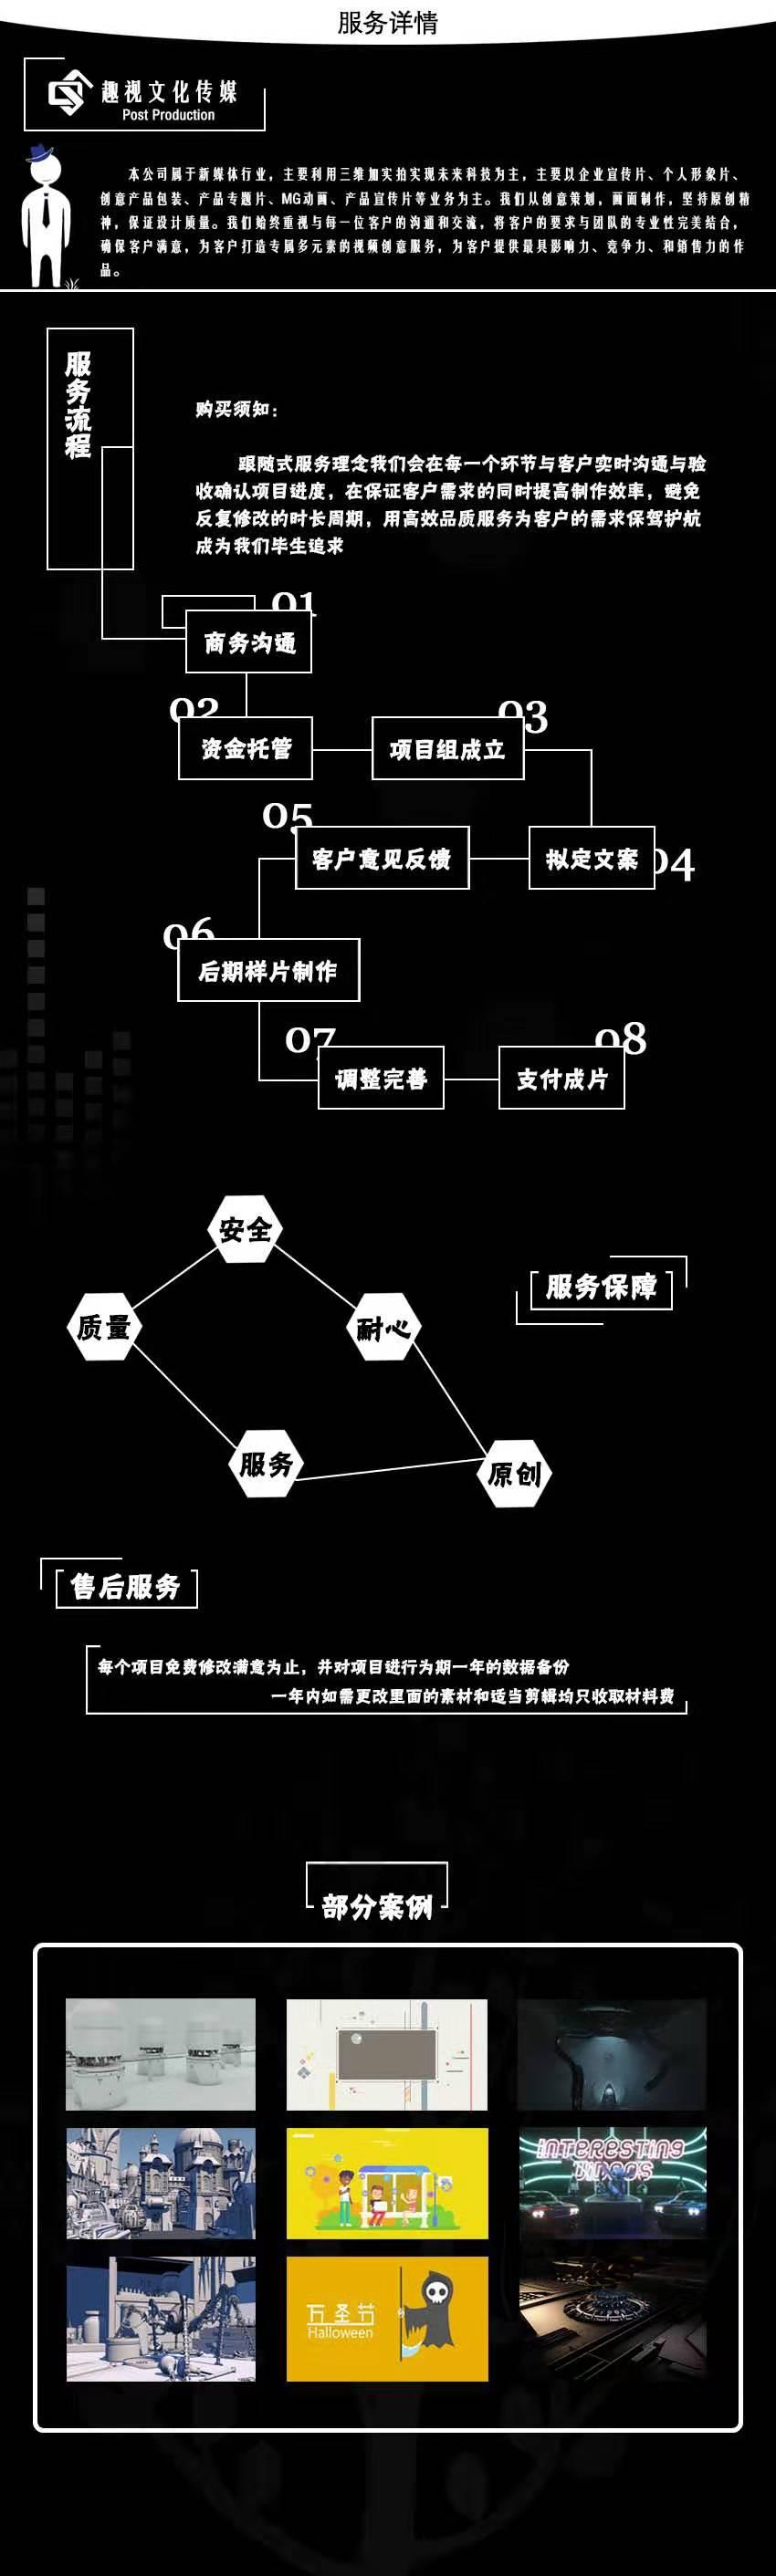 _【MG动画】飞碟说MG动画设计二维动画flash动画mg视频2